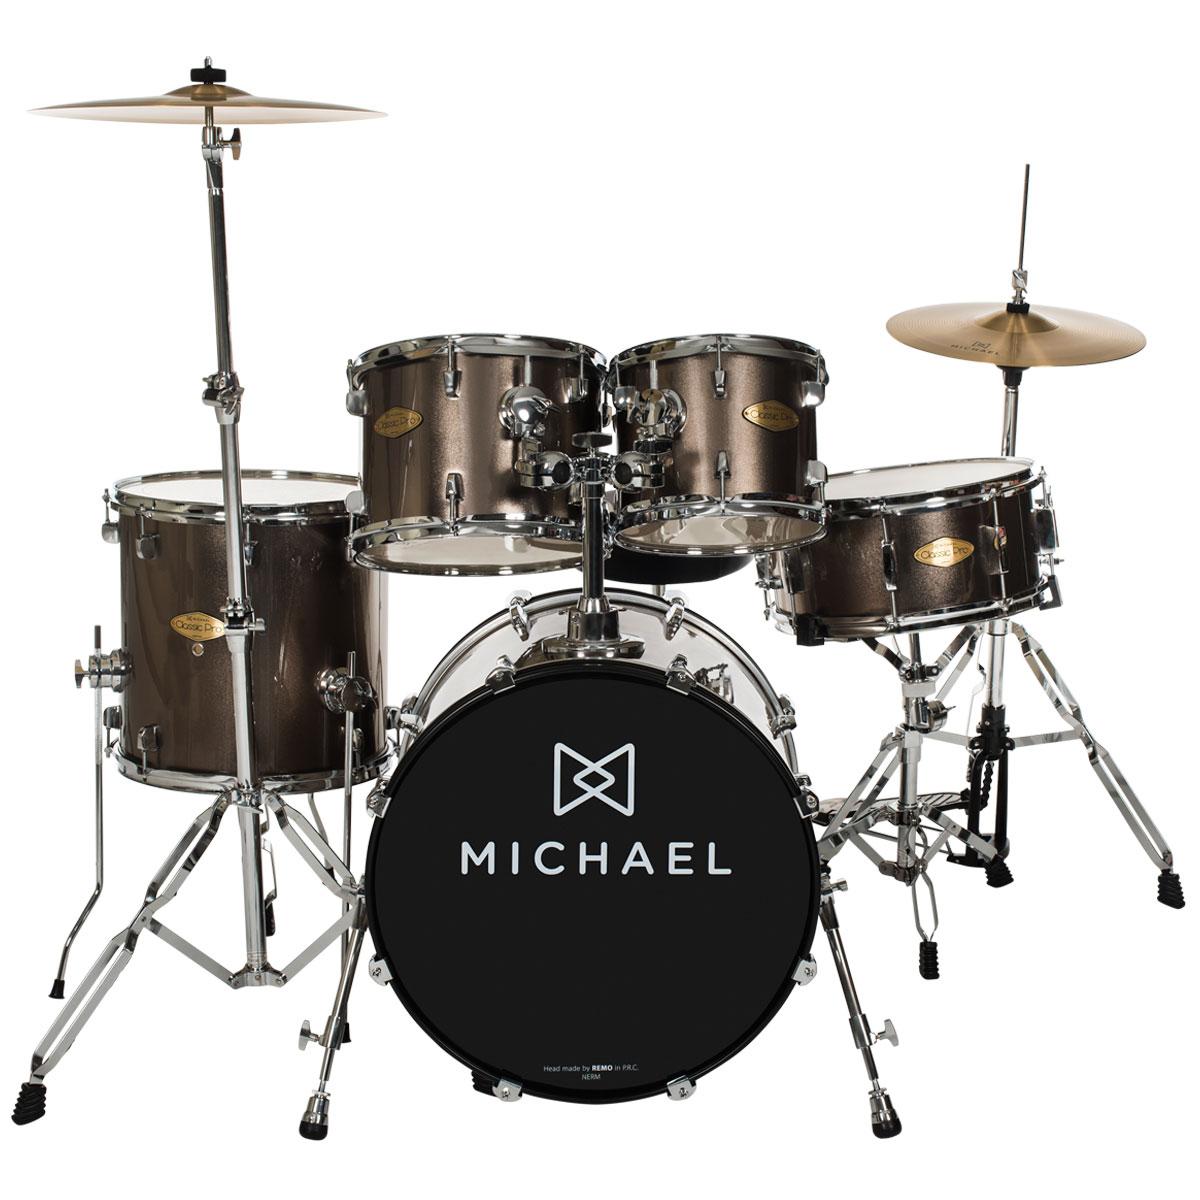 Bateria Acústica Bumbo 18 Pol - Classic Pro DM 841 CHR Michael